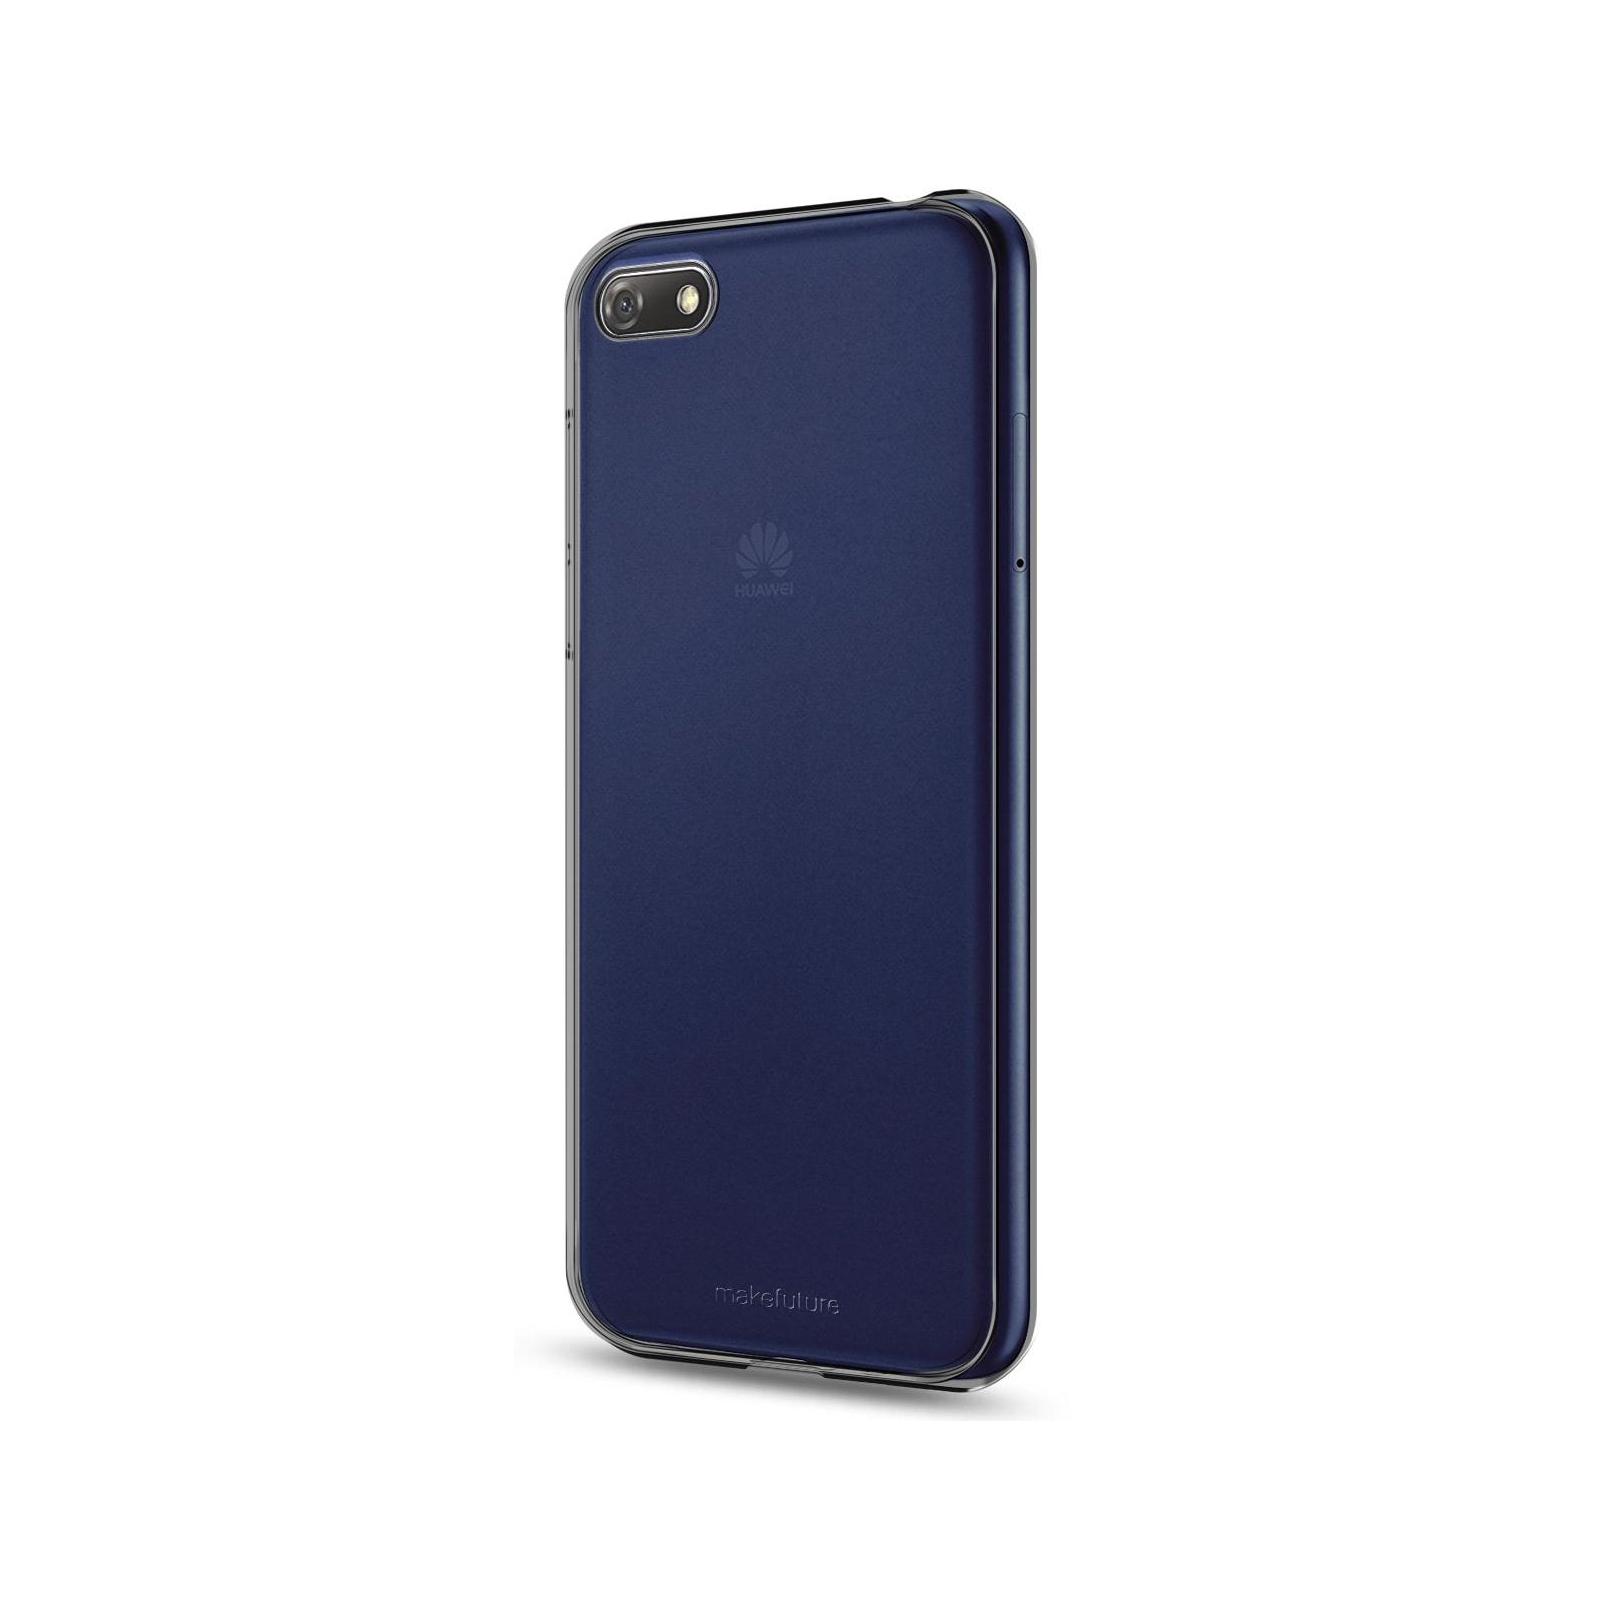 Чехол для моб. телефона MakeFuture Air Case (Clear TPU) Huawei Y6 2018 Black (MCA-HUY618BK) изображение 2